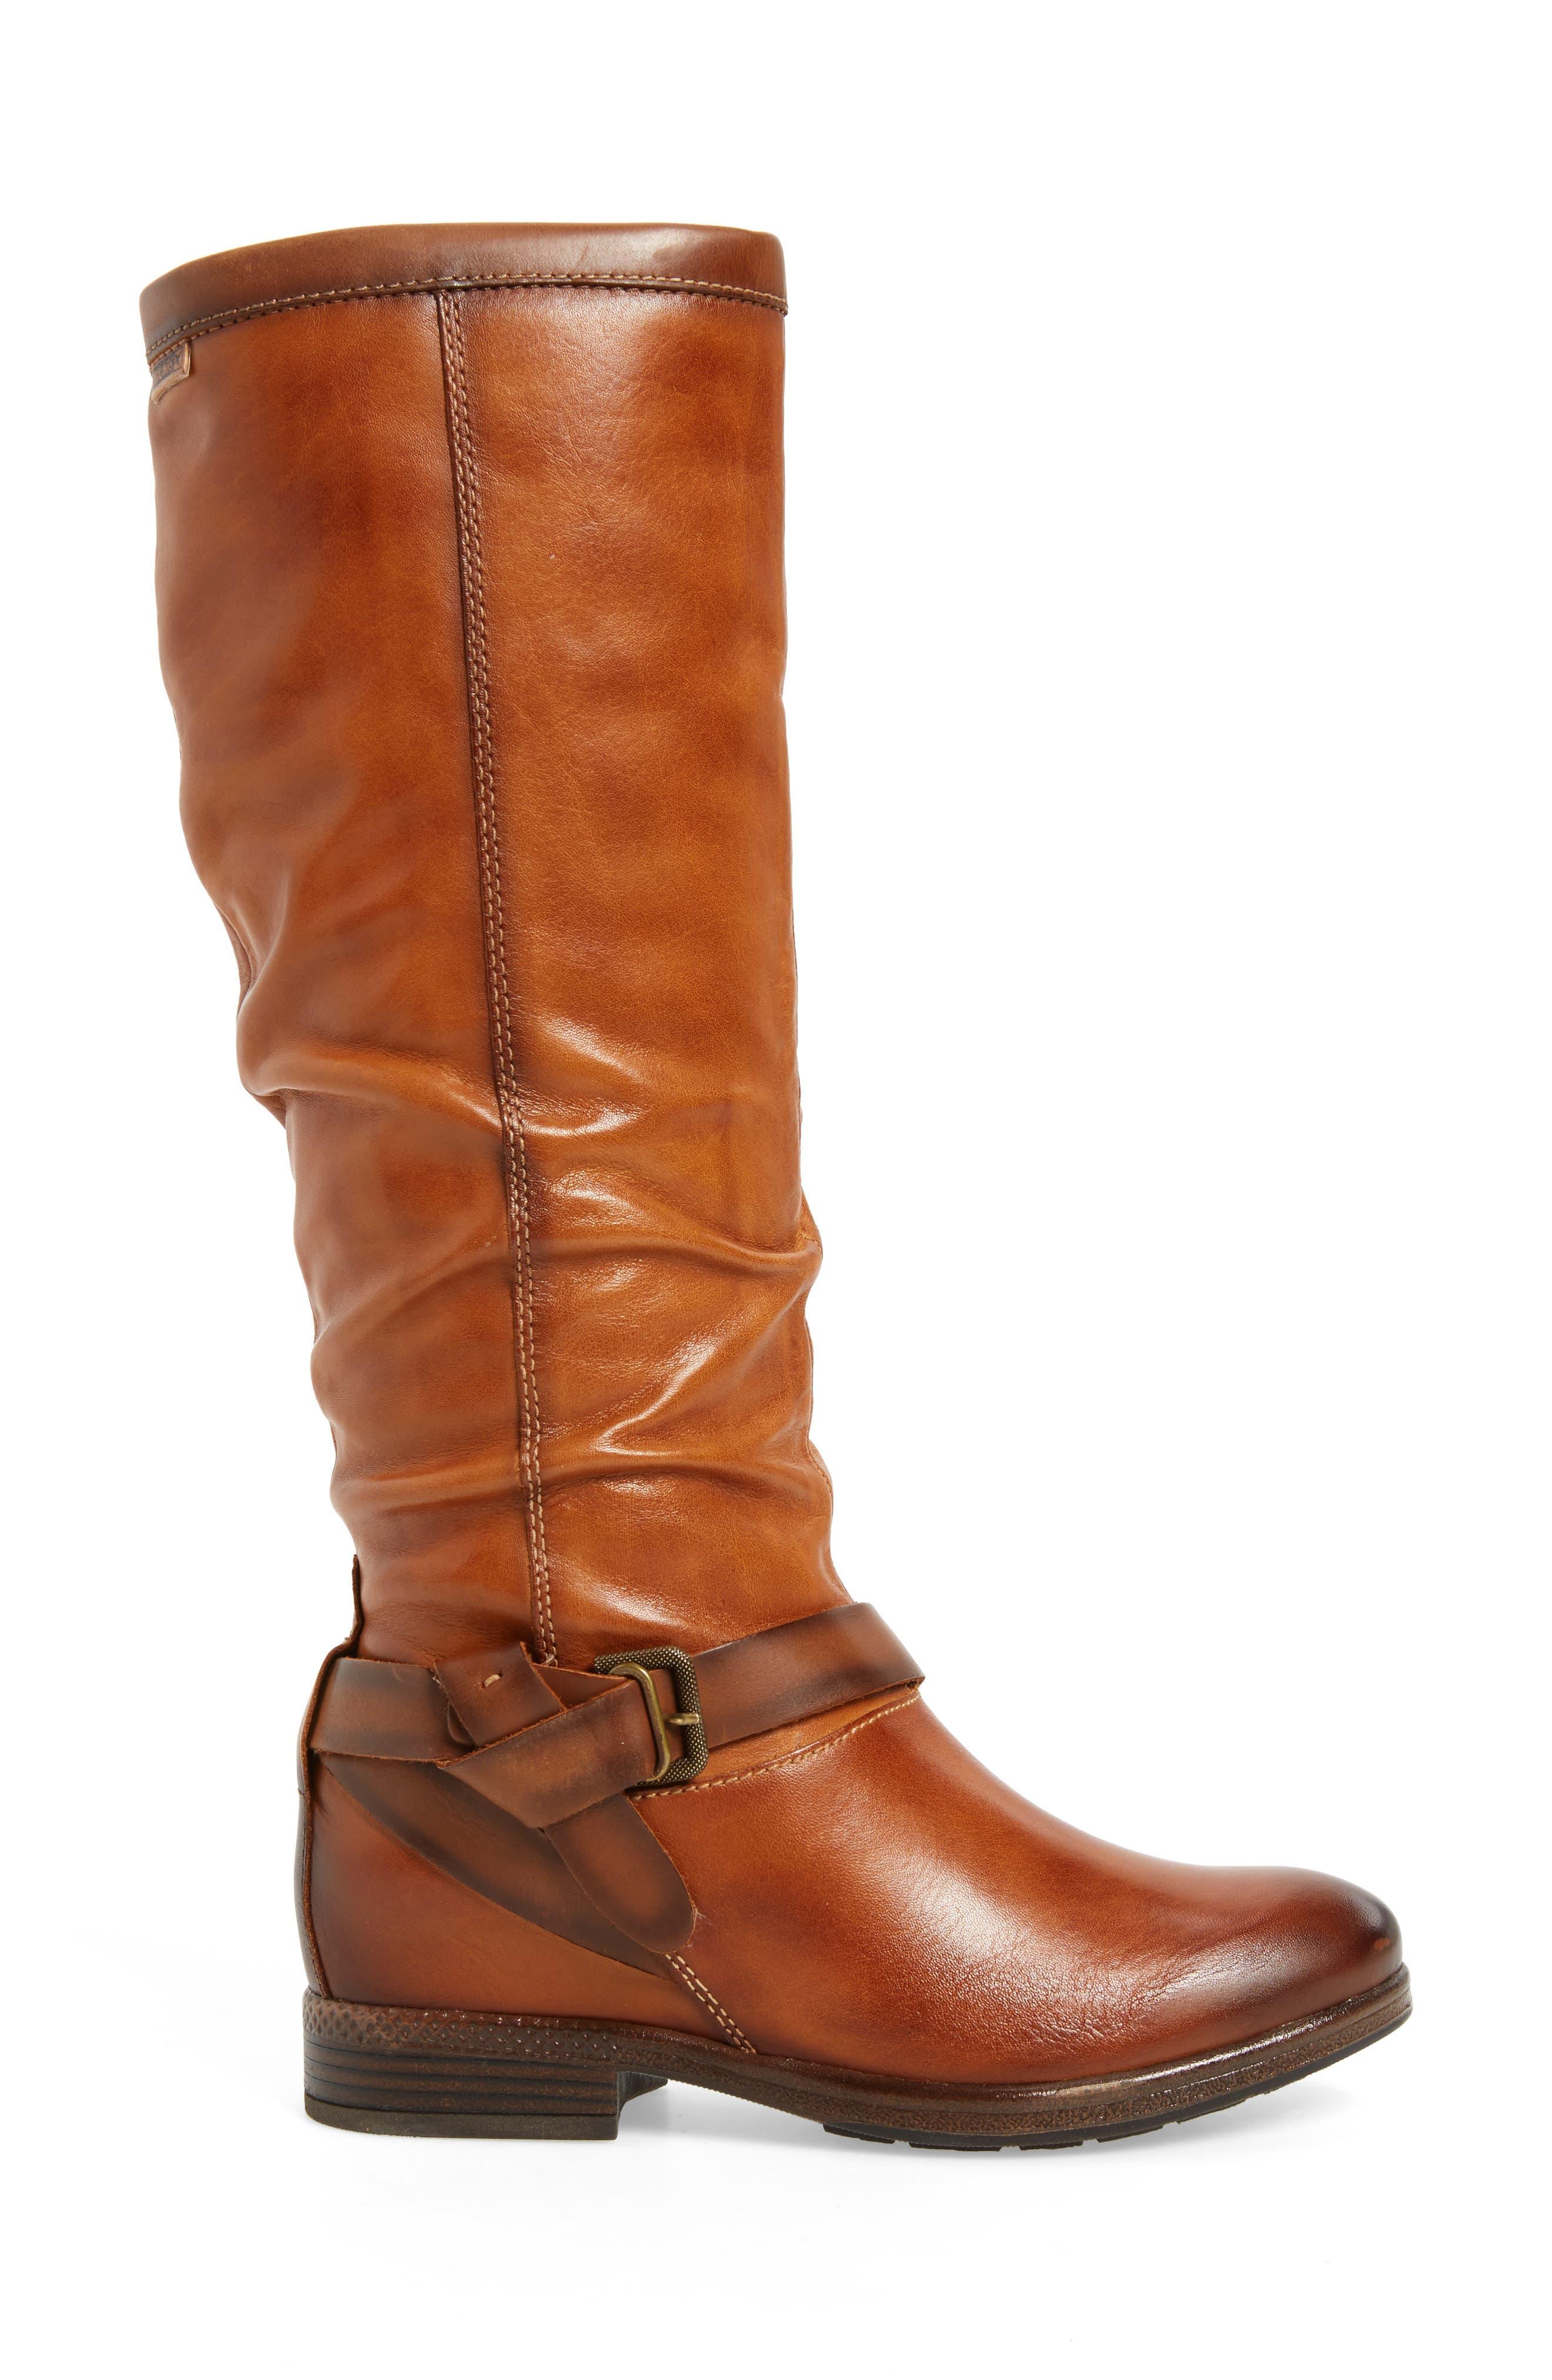 Ordino Knee High Boot,                             Alternate thumbnail 3, color,                             Brandy Cuero Leather